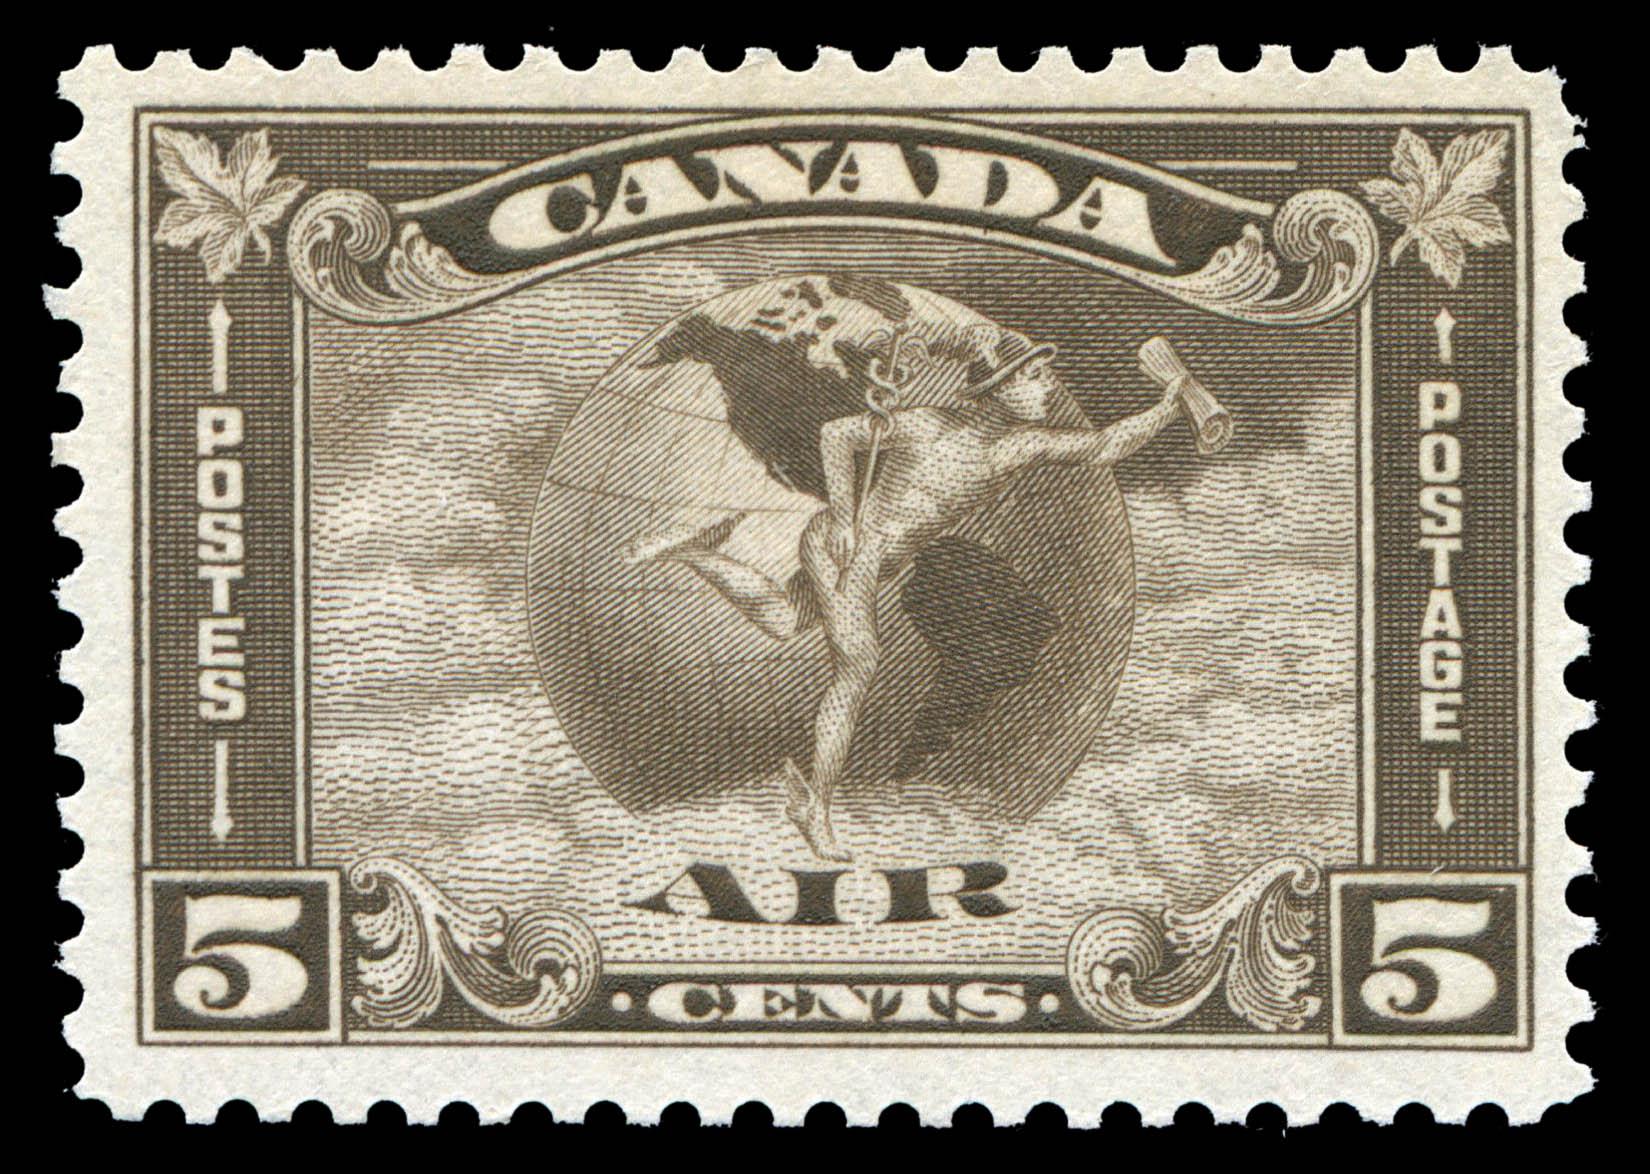 Mercury, Air Canada Postage Stamp